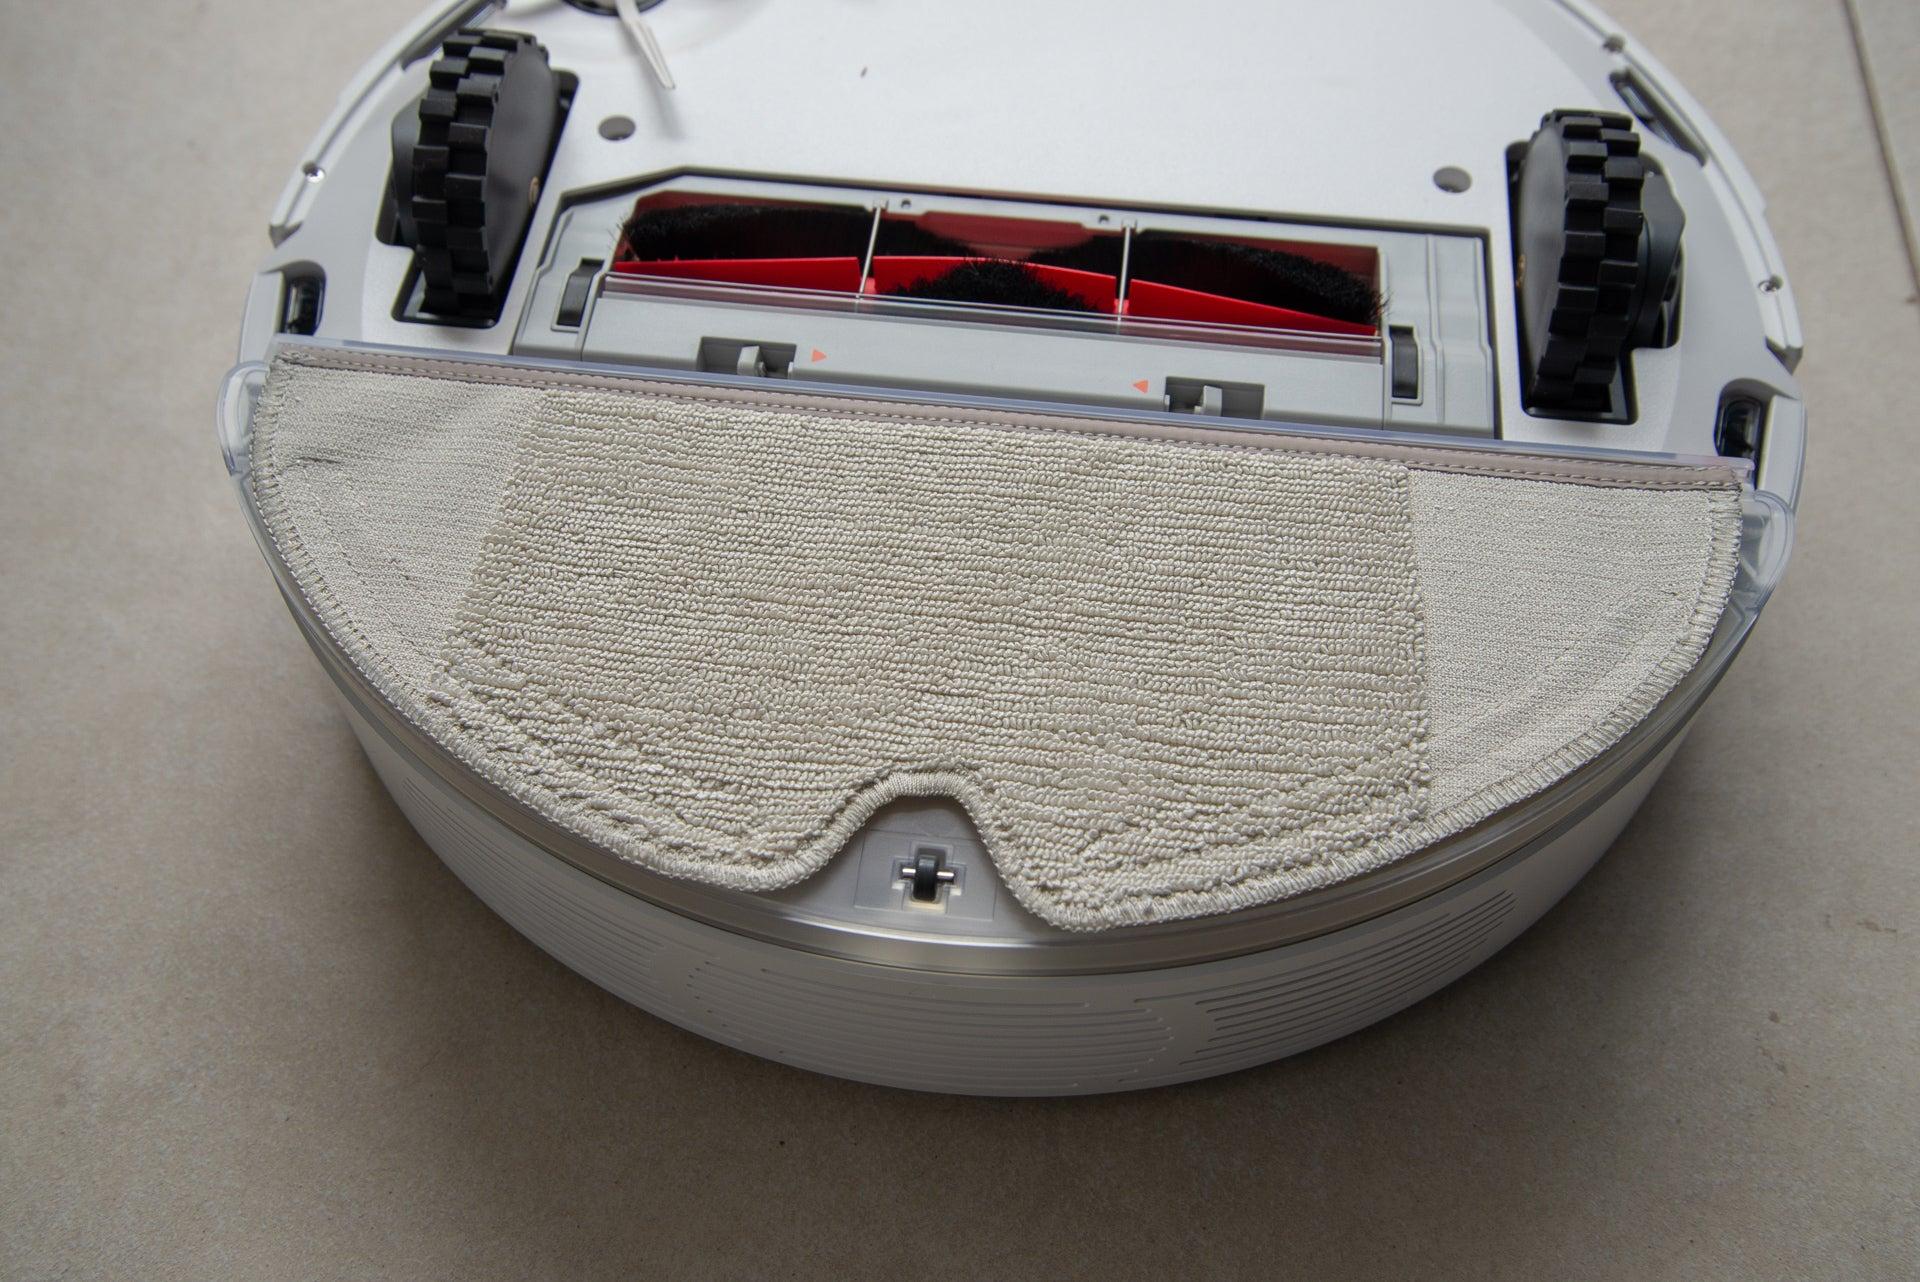 Roborock S6 microfibre cleaning cloth